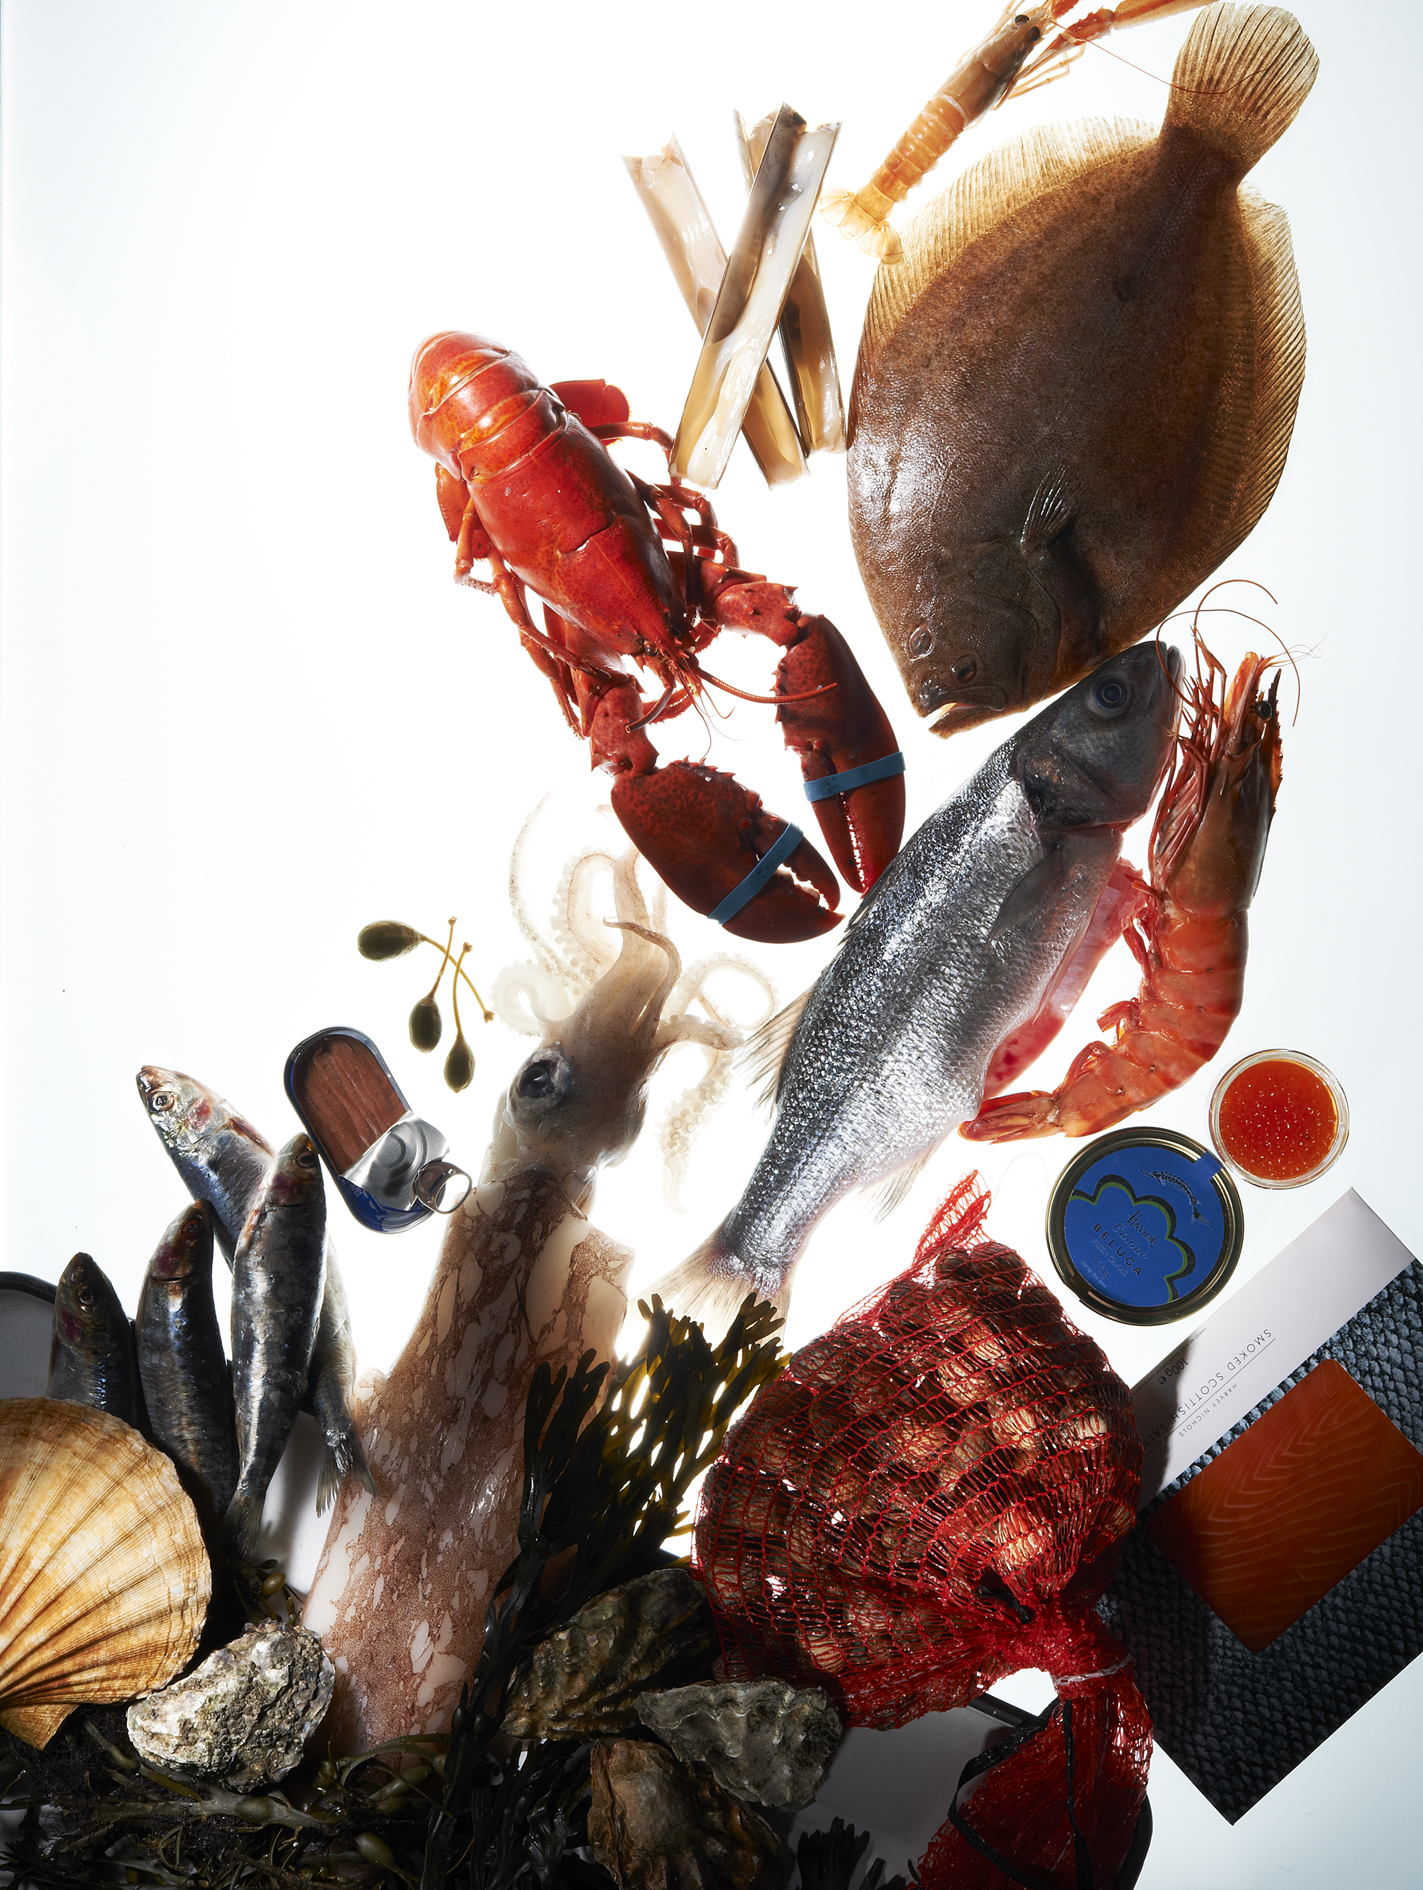 ES-xmas food-fish MAIN low res.jpg